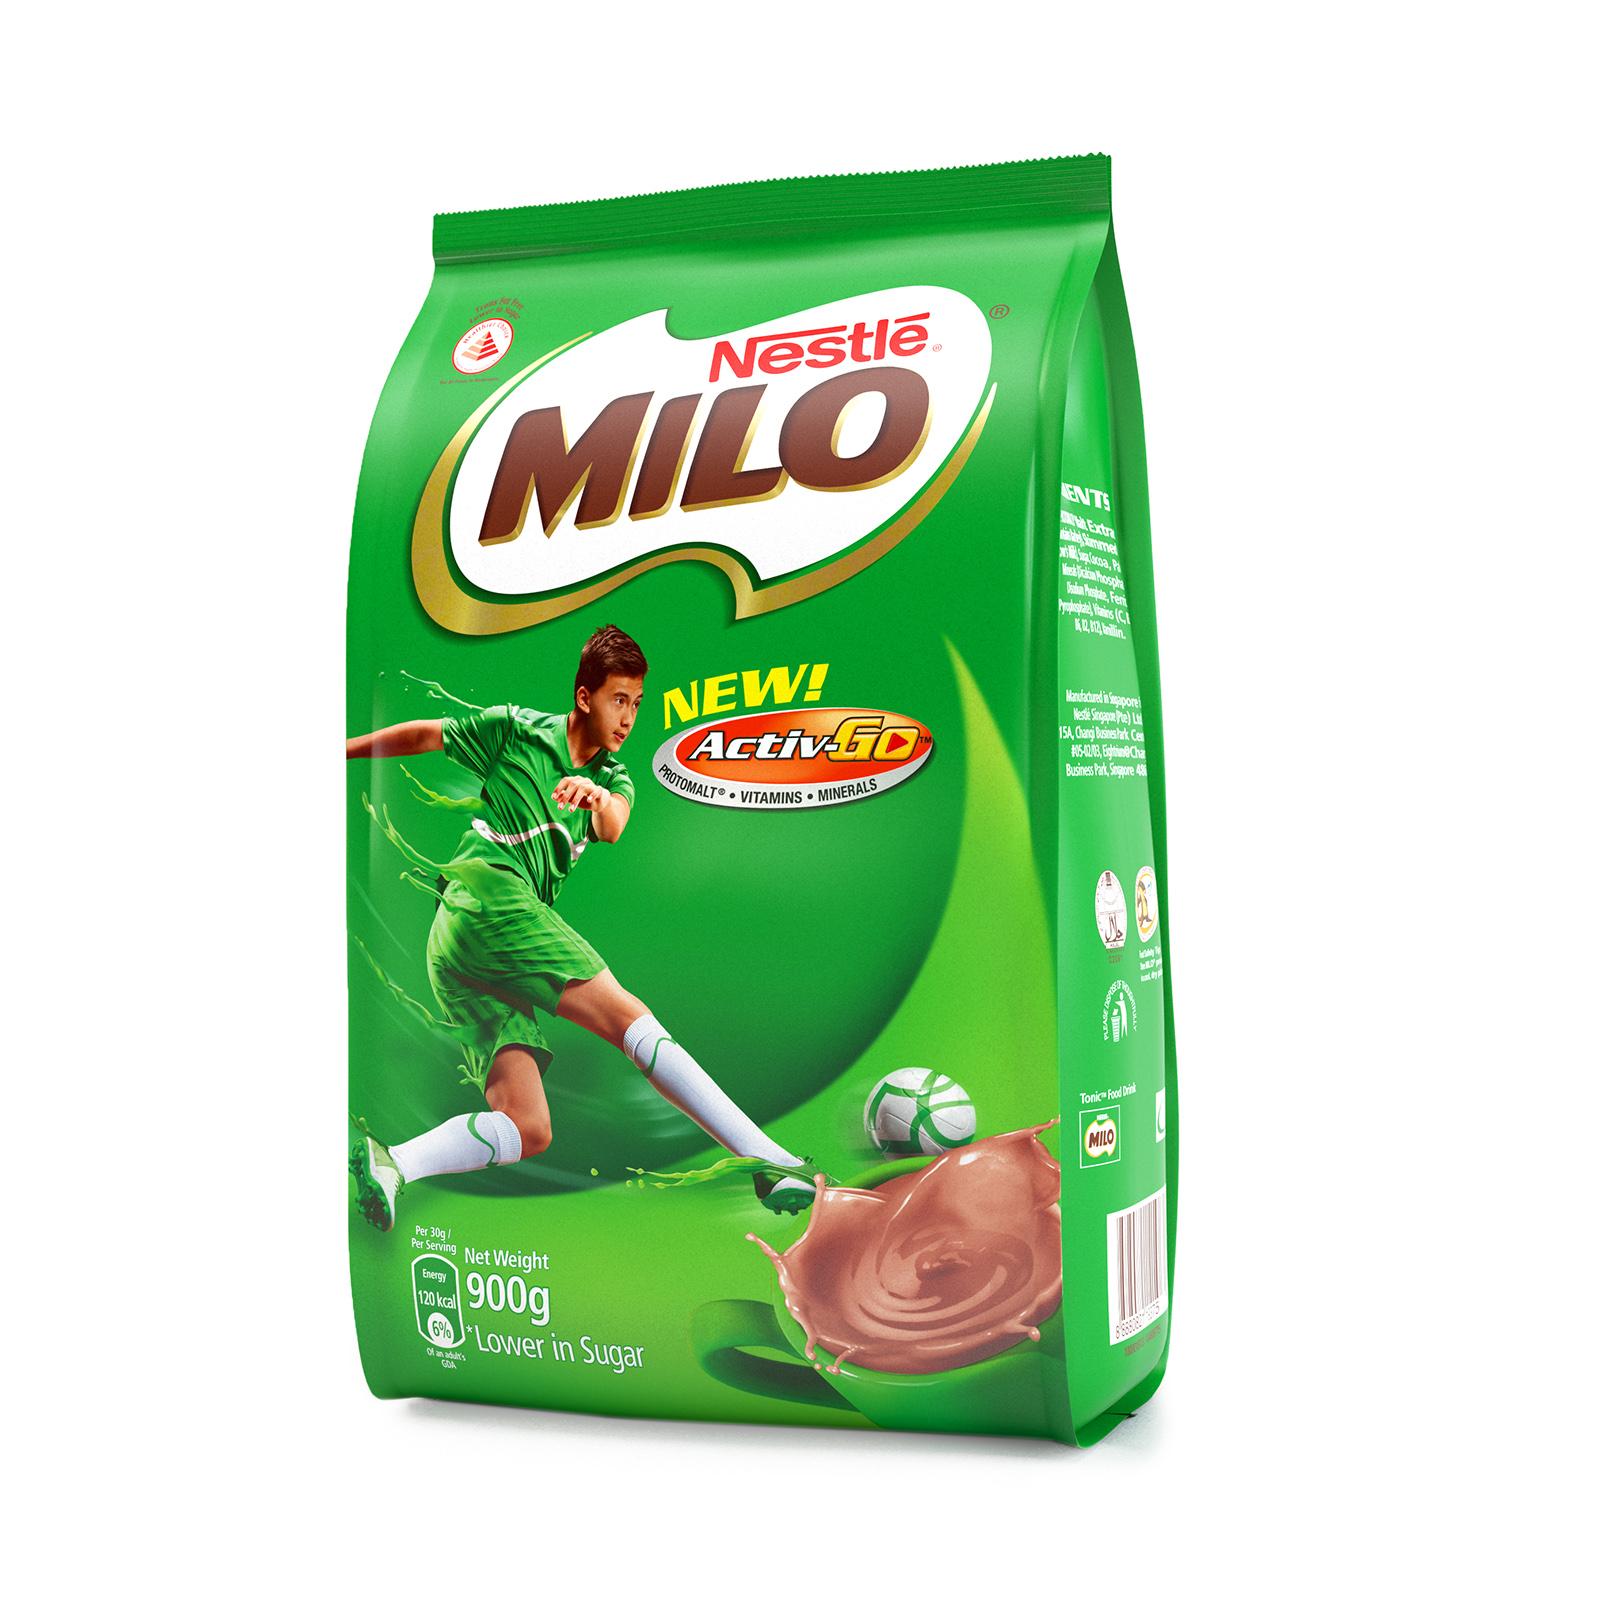 Milo Refill Pack